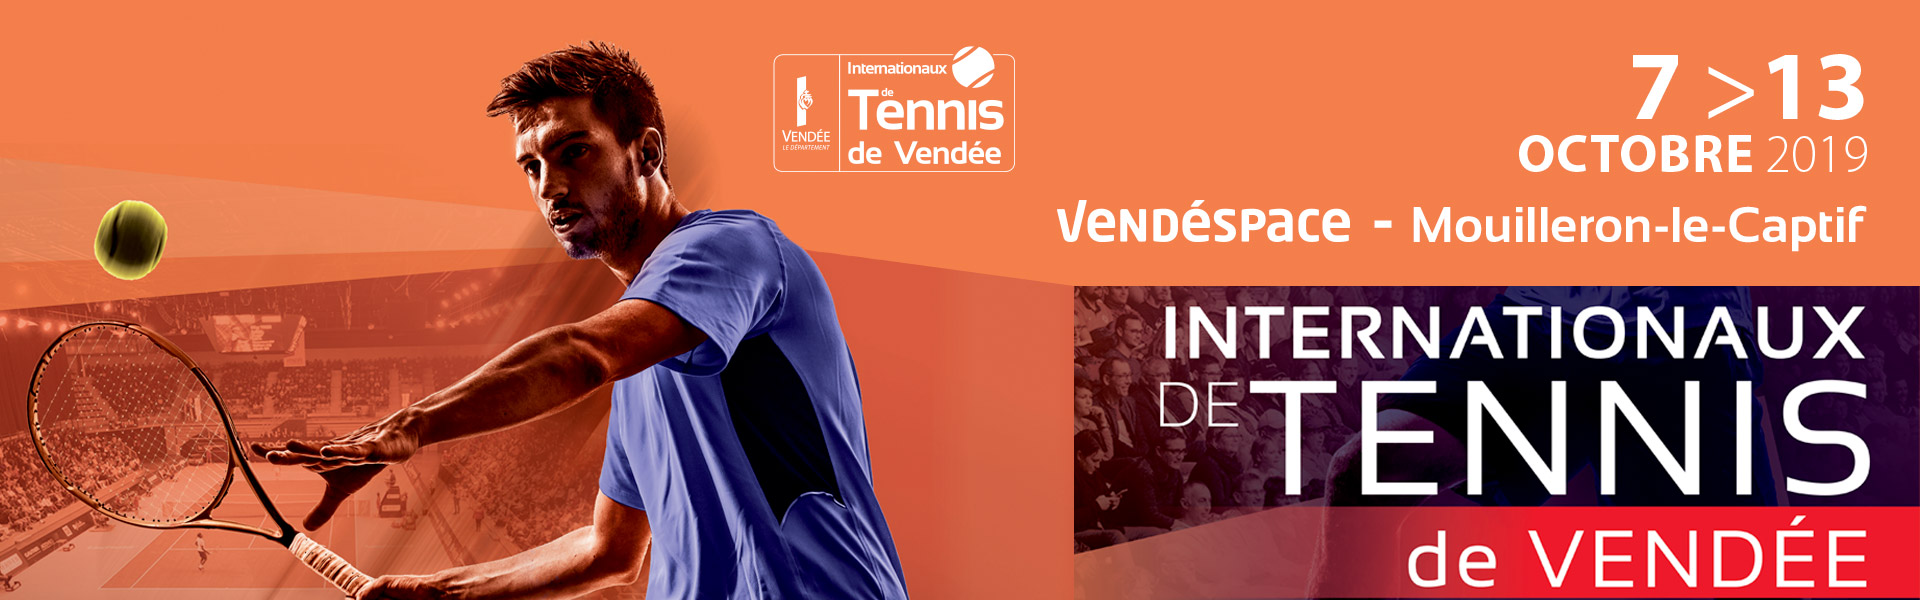 Internationaux de Tennis de Vendée